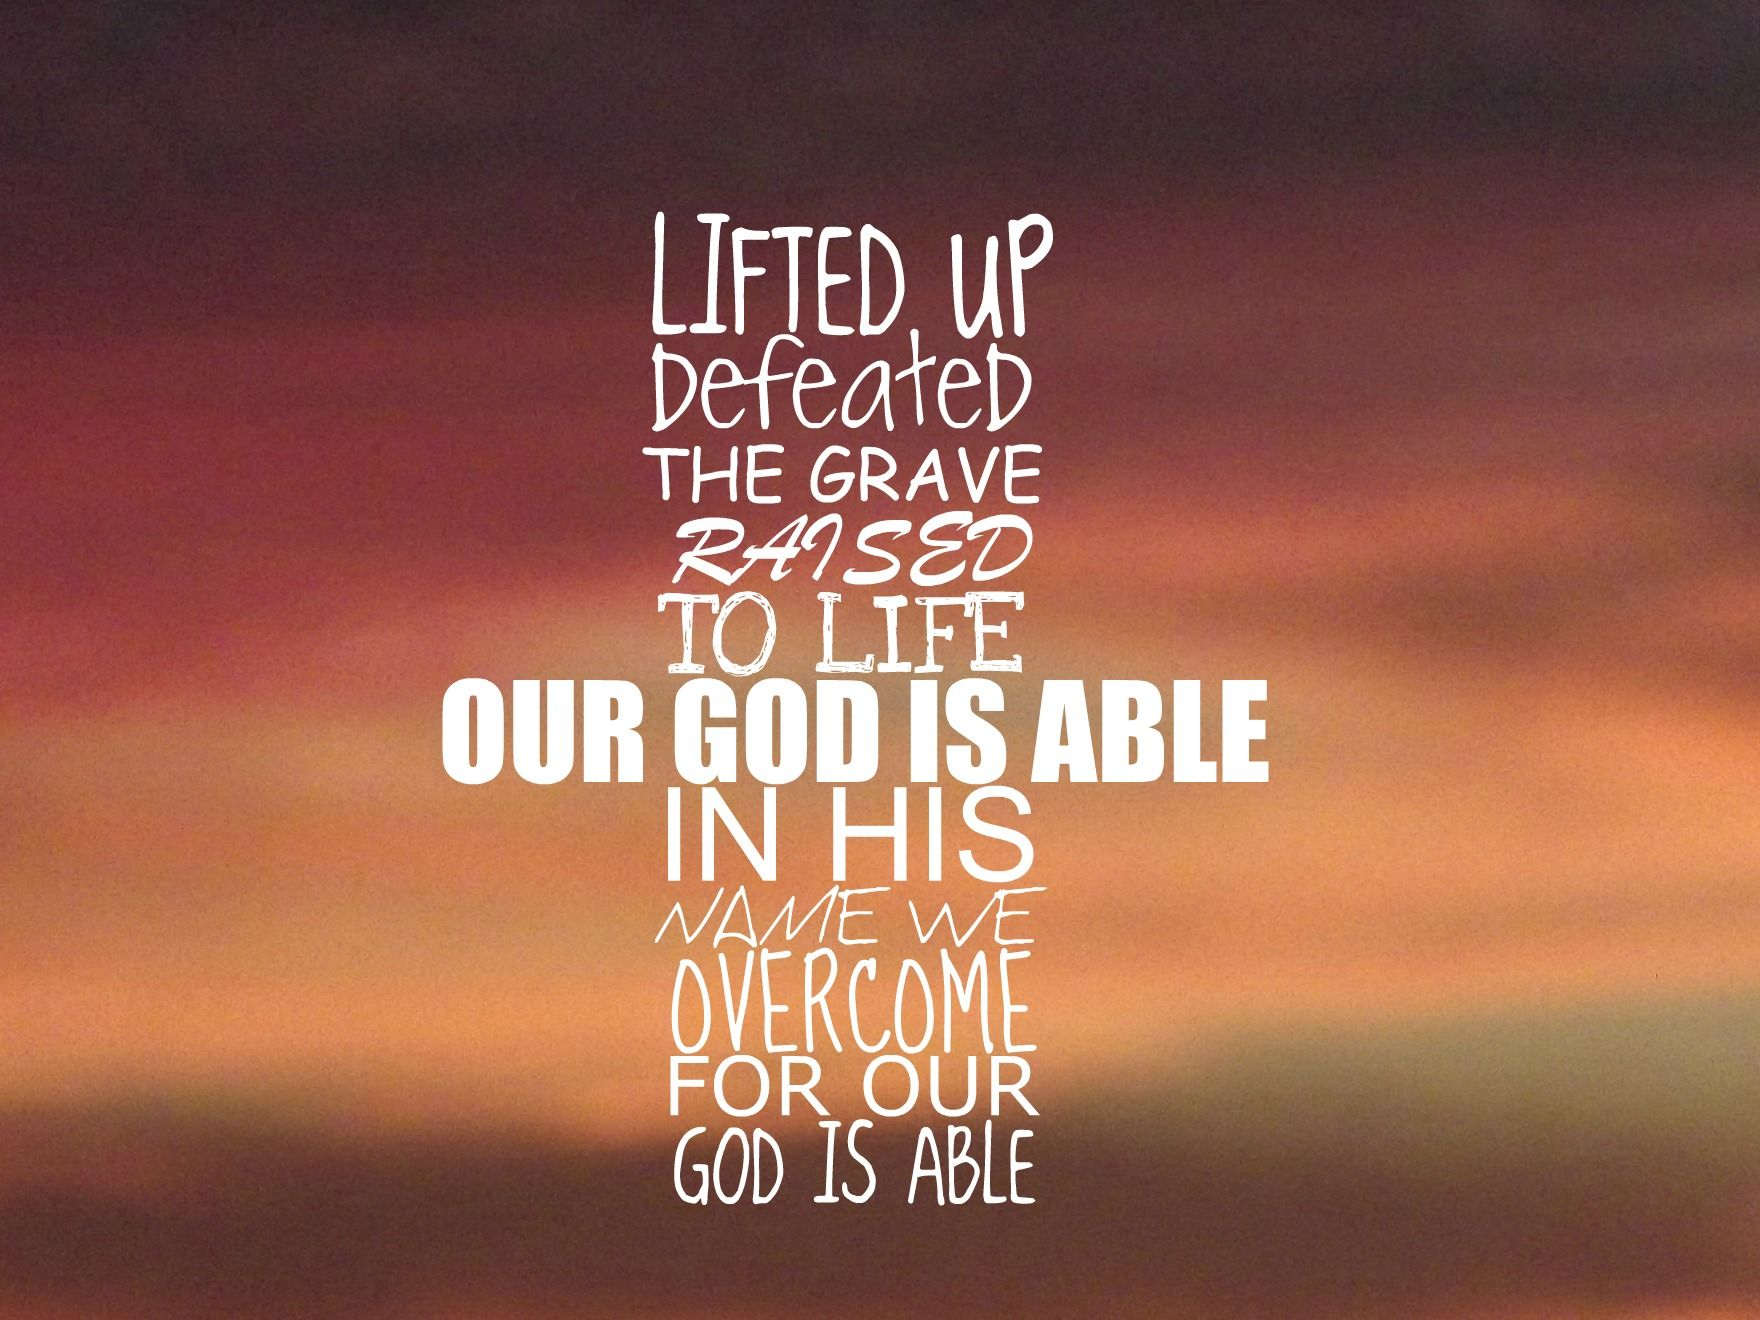 Our god is able hillsong lyrics